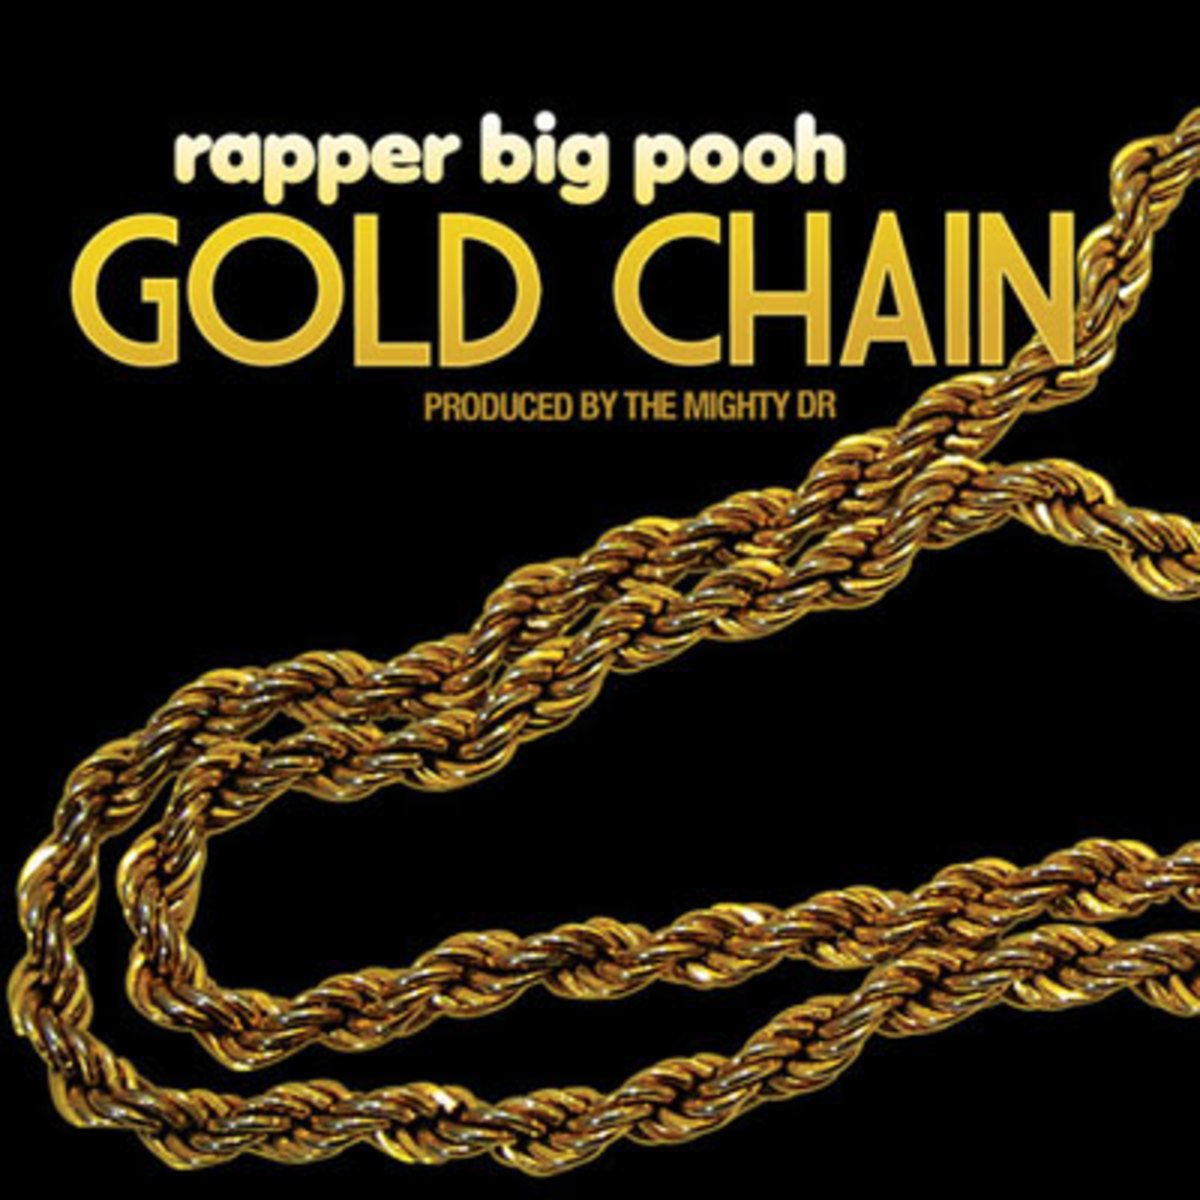 rapperpooh-goldchain.jpg